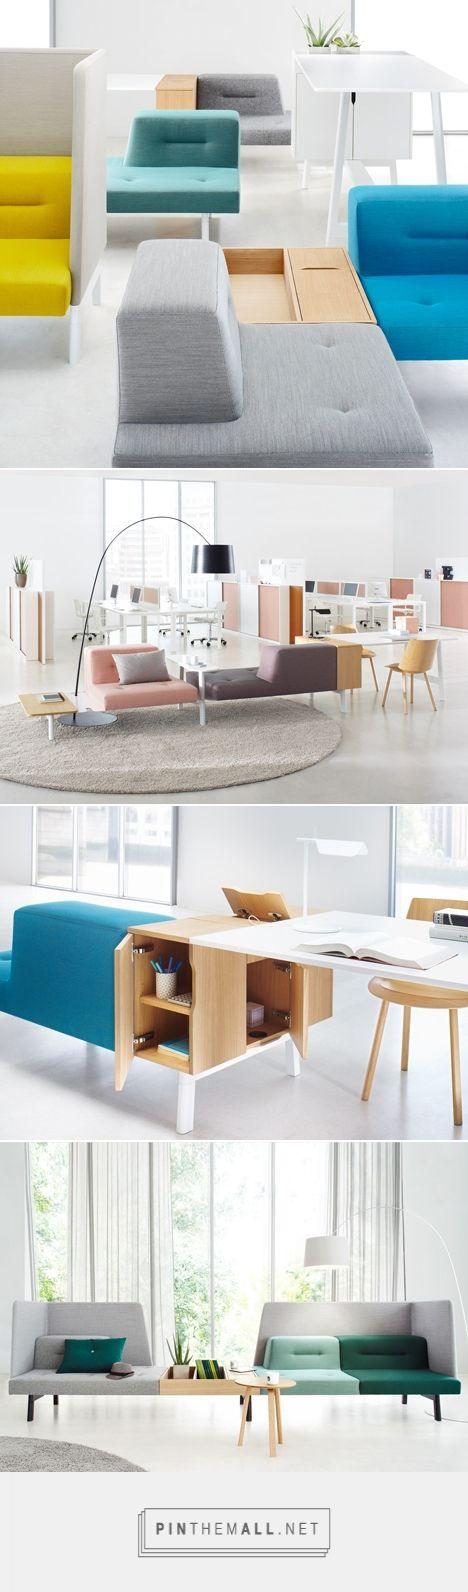 Docks Furniture System For Ophelis By Till Grosch And Bjorn Meier Meier